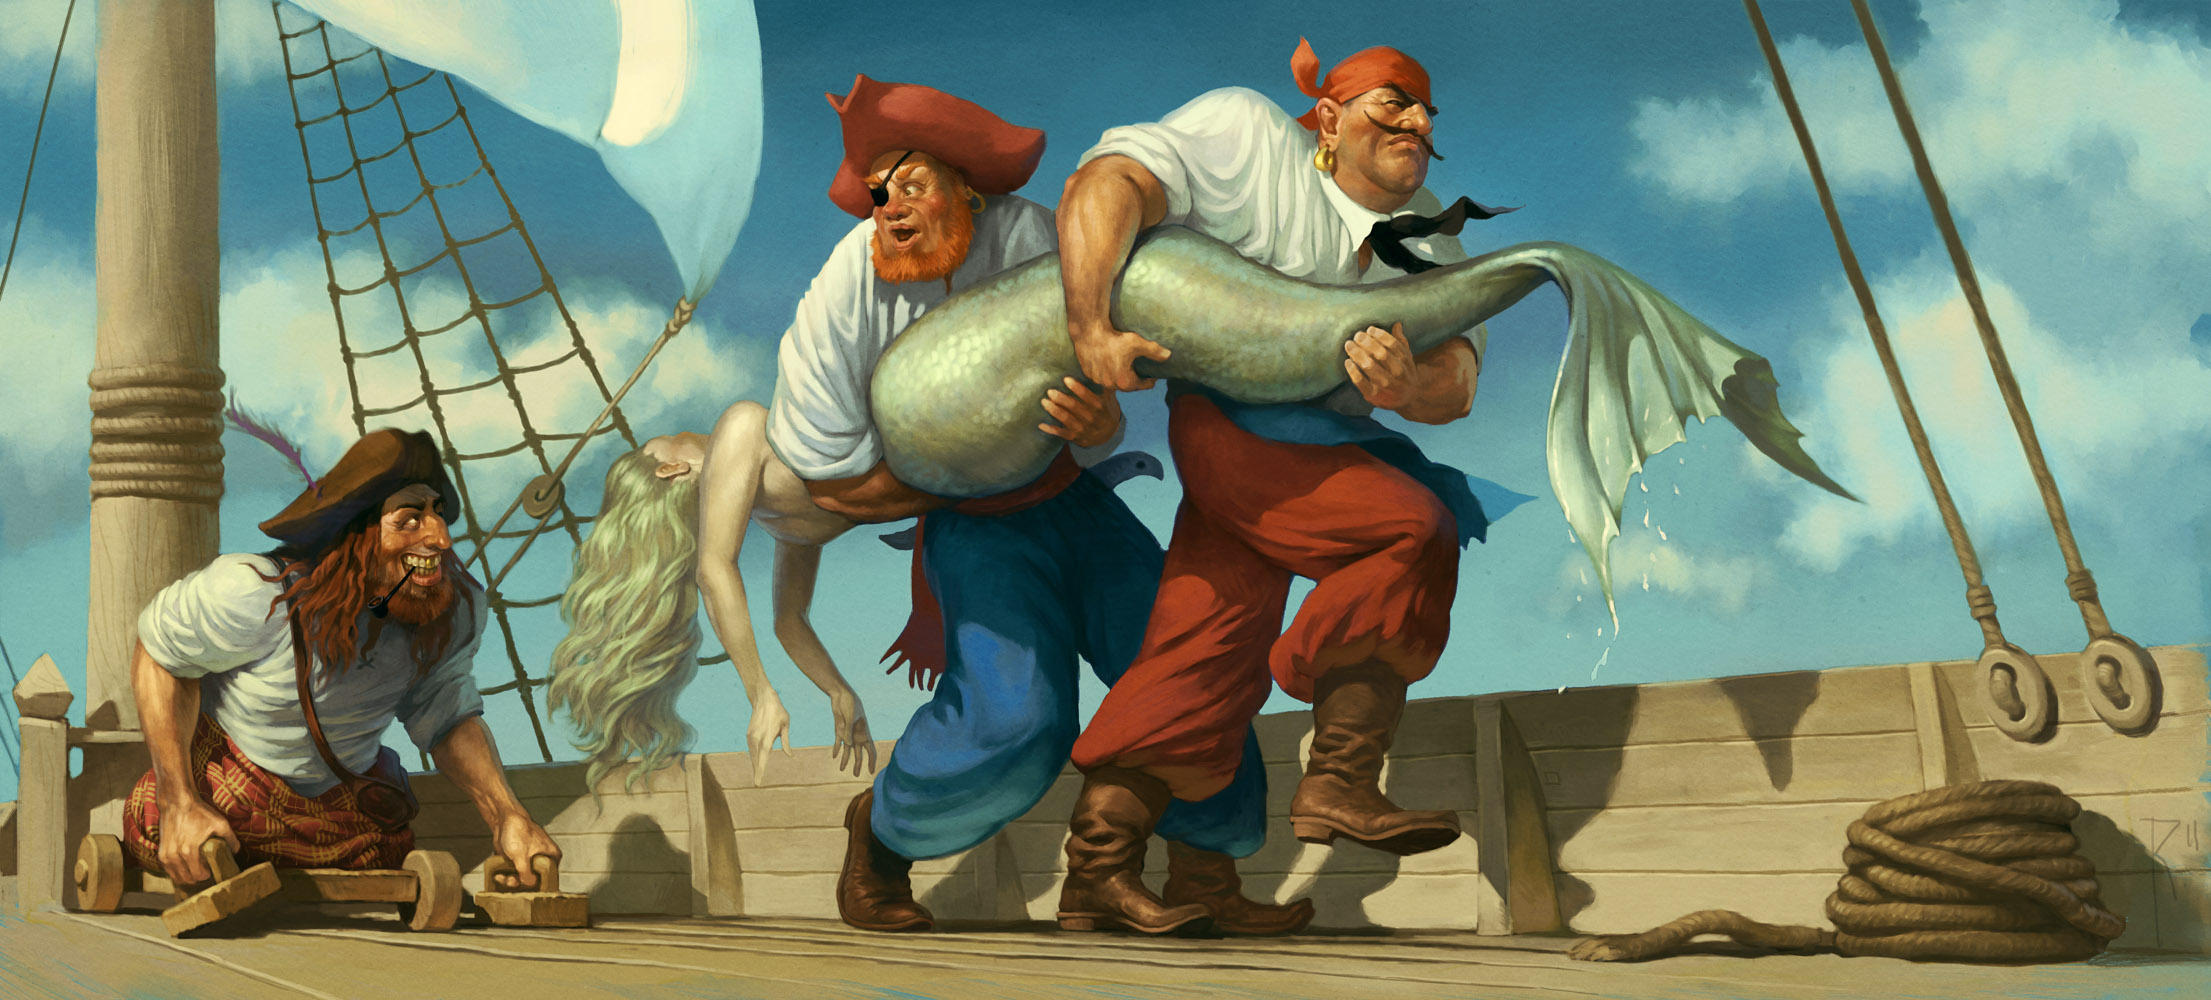 Big fish by Waldemar-Kazak